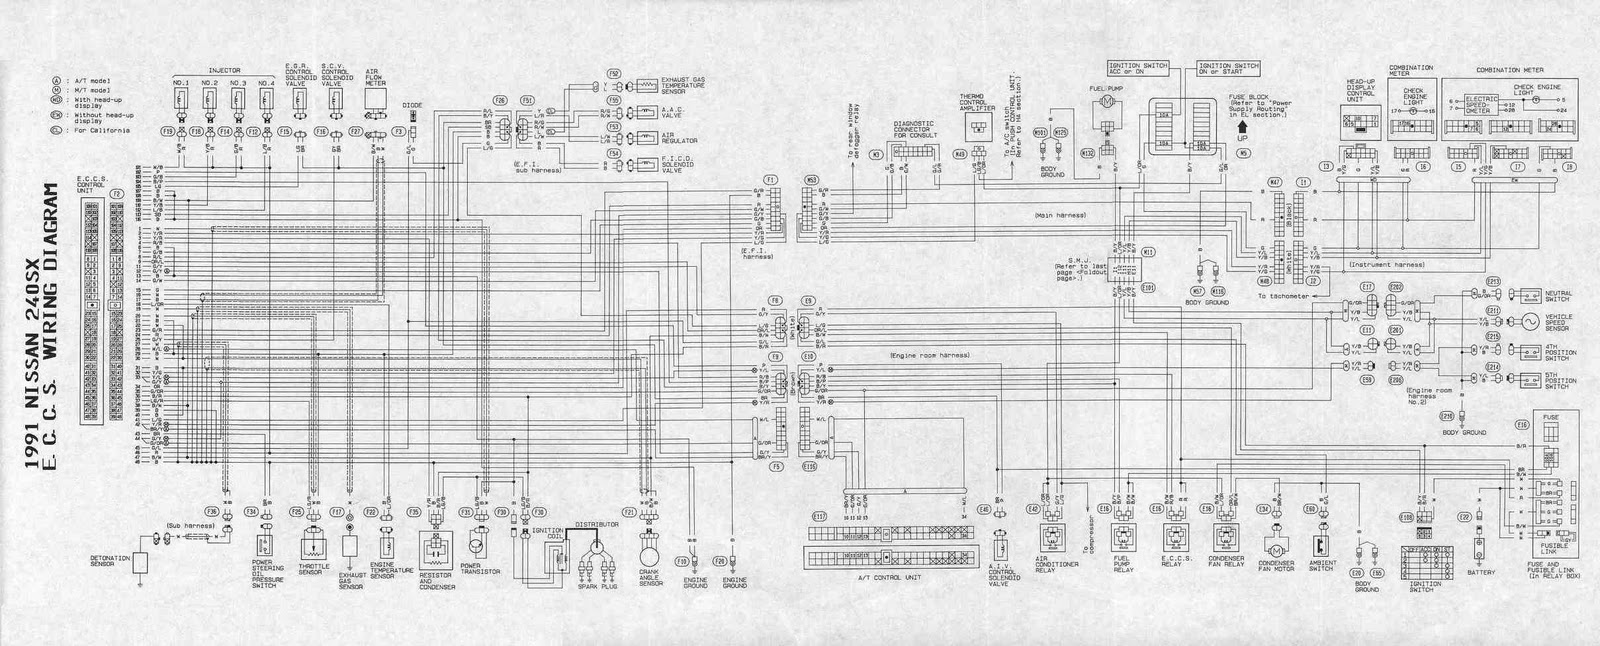 s14 sr20det wiring harness diagram pioneer appradio 3 wire diagram, Wiring diagram